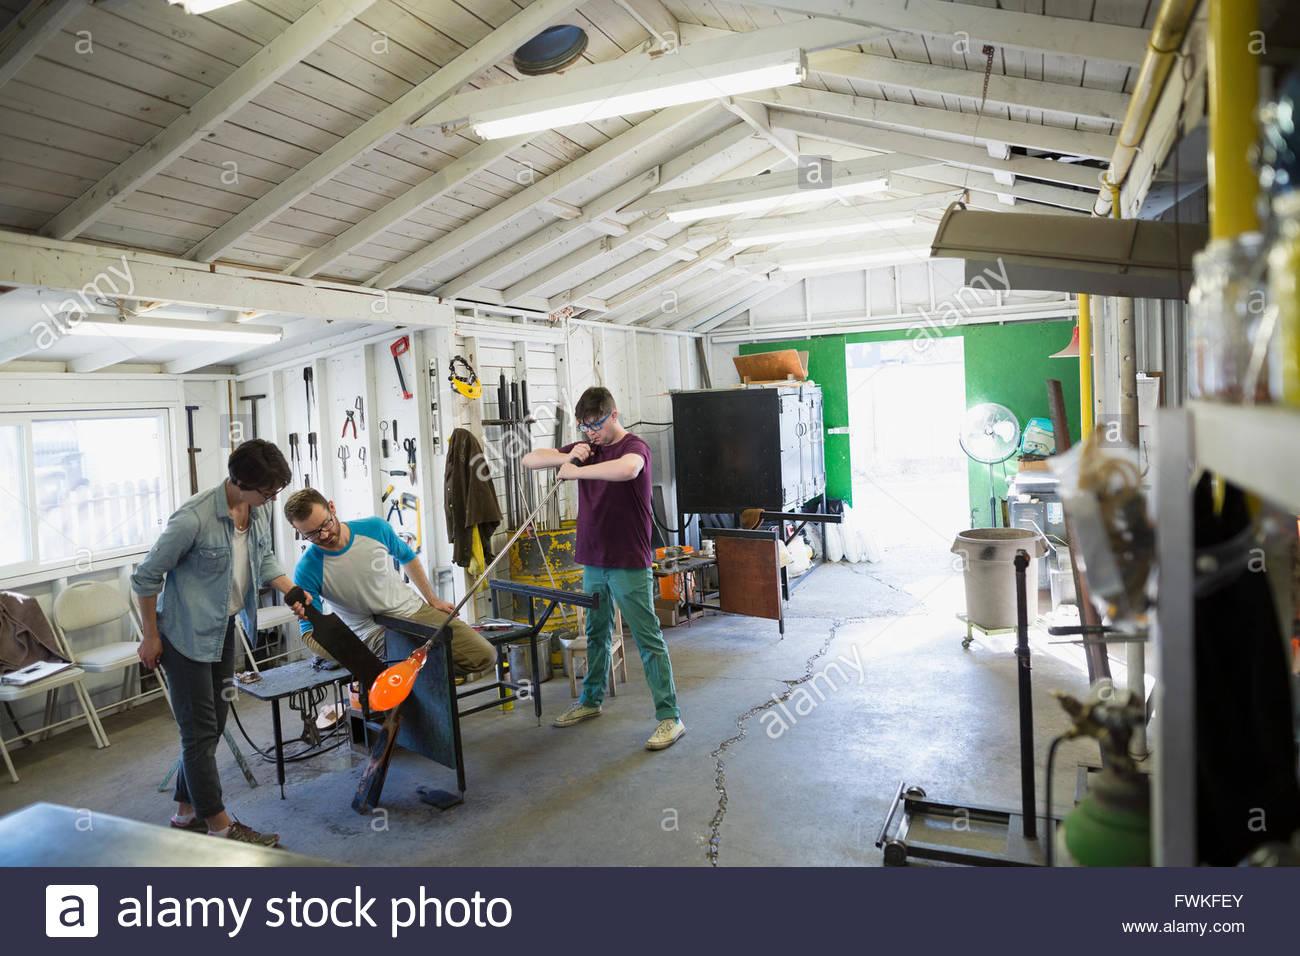 Glassblowers blowing molten glass in workshop - Stock Image